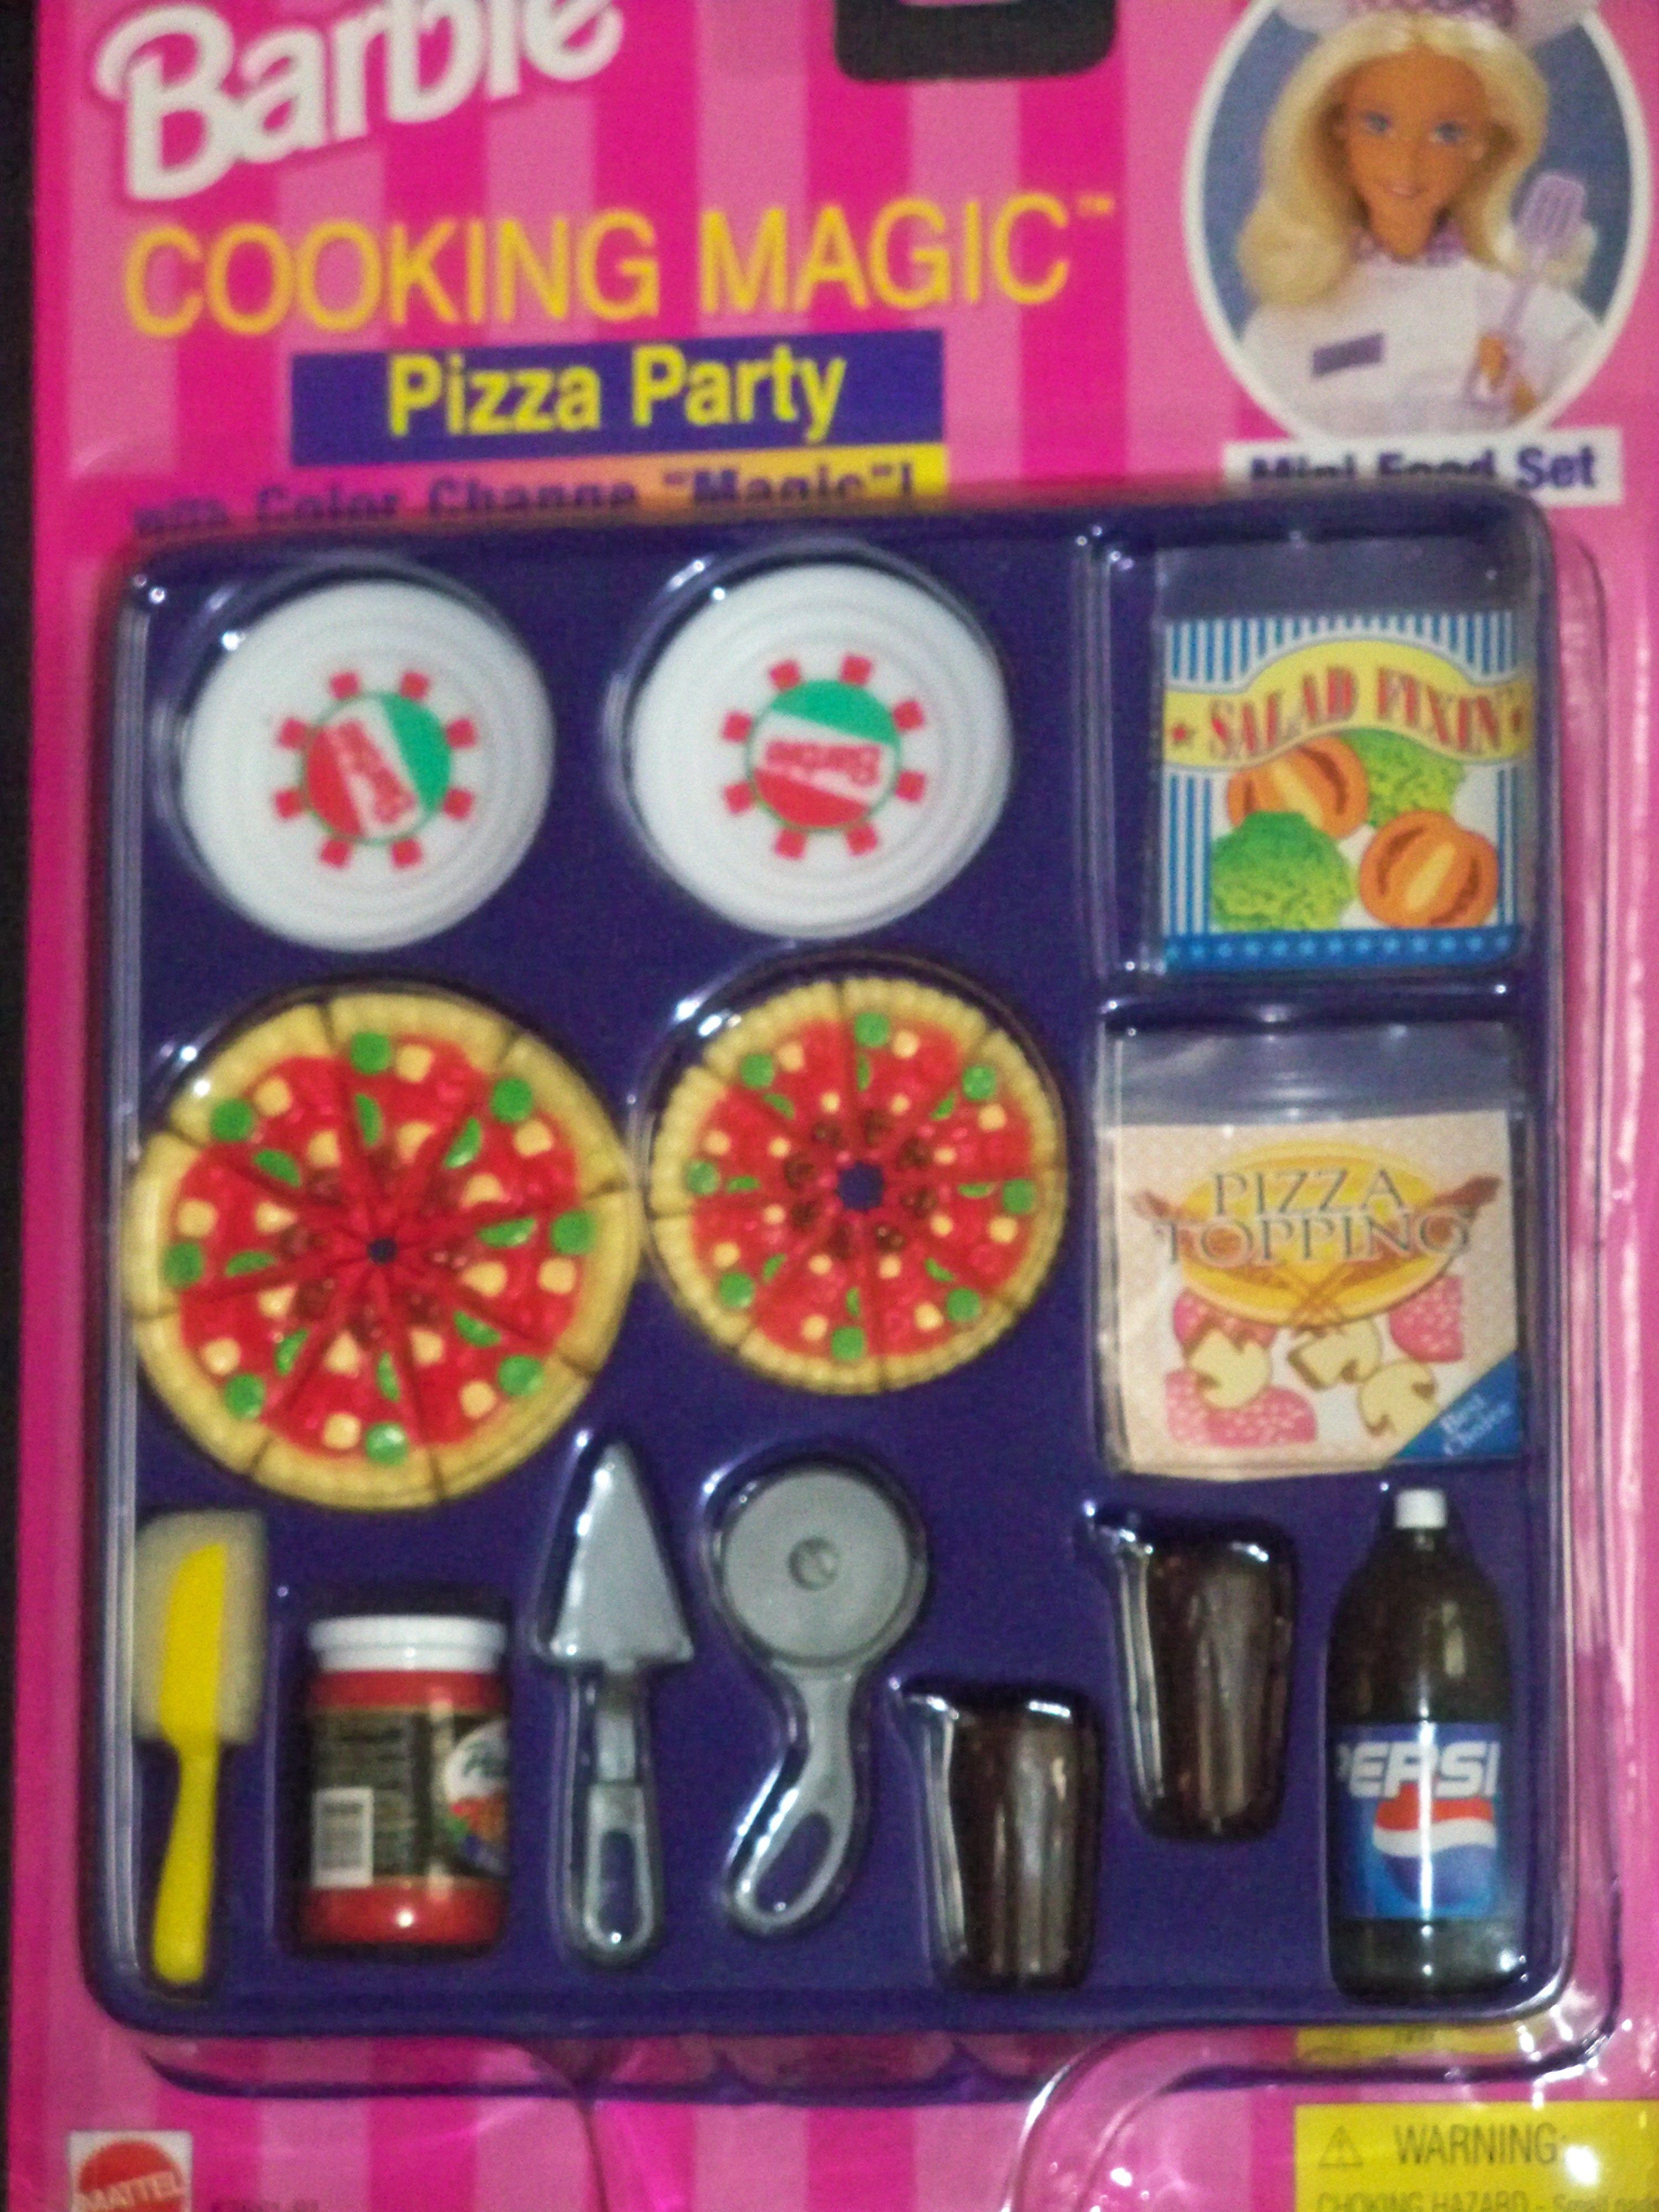 1997 Barbie Cooking Magic Pizza Party 67681 91 Mini Food Set With Color Change Magic Pepsi Soda Ragu Barbie Accessories Barbie Food Diy Barbie Furniture